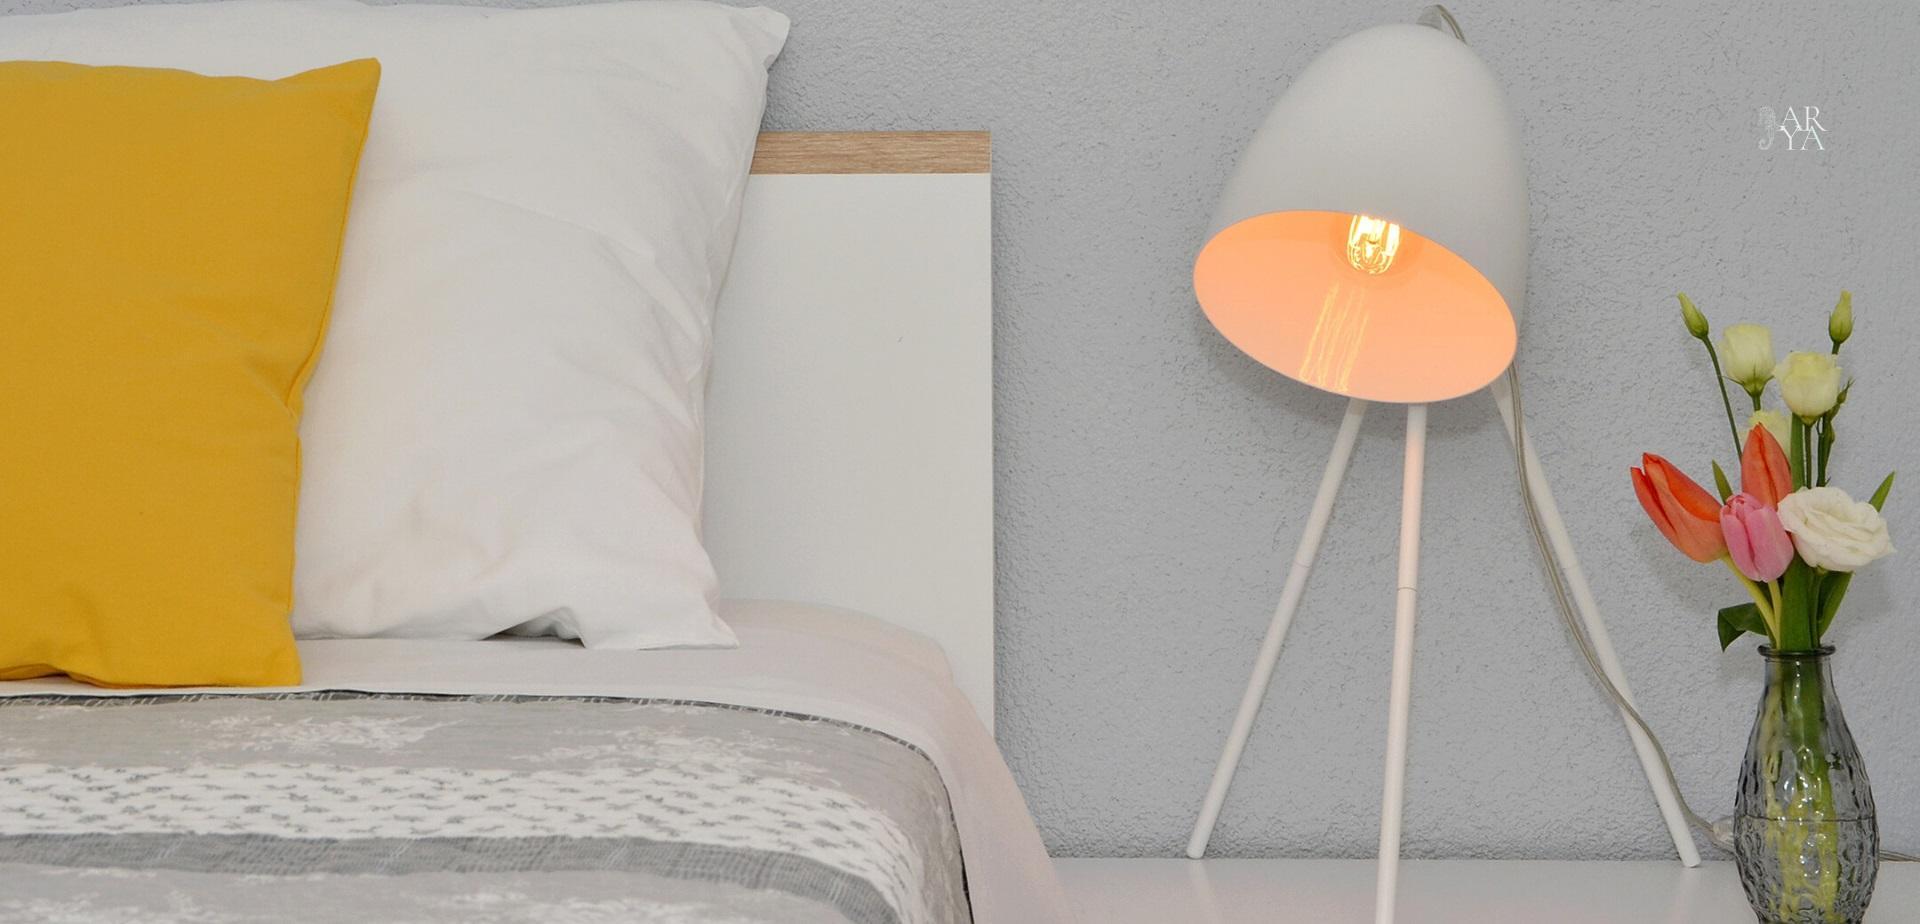 apartment arya makarska accommodation croatia 1 bedroom